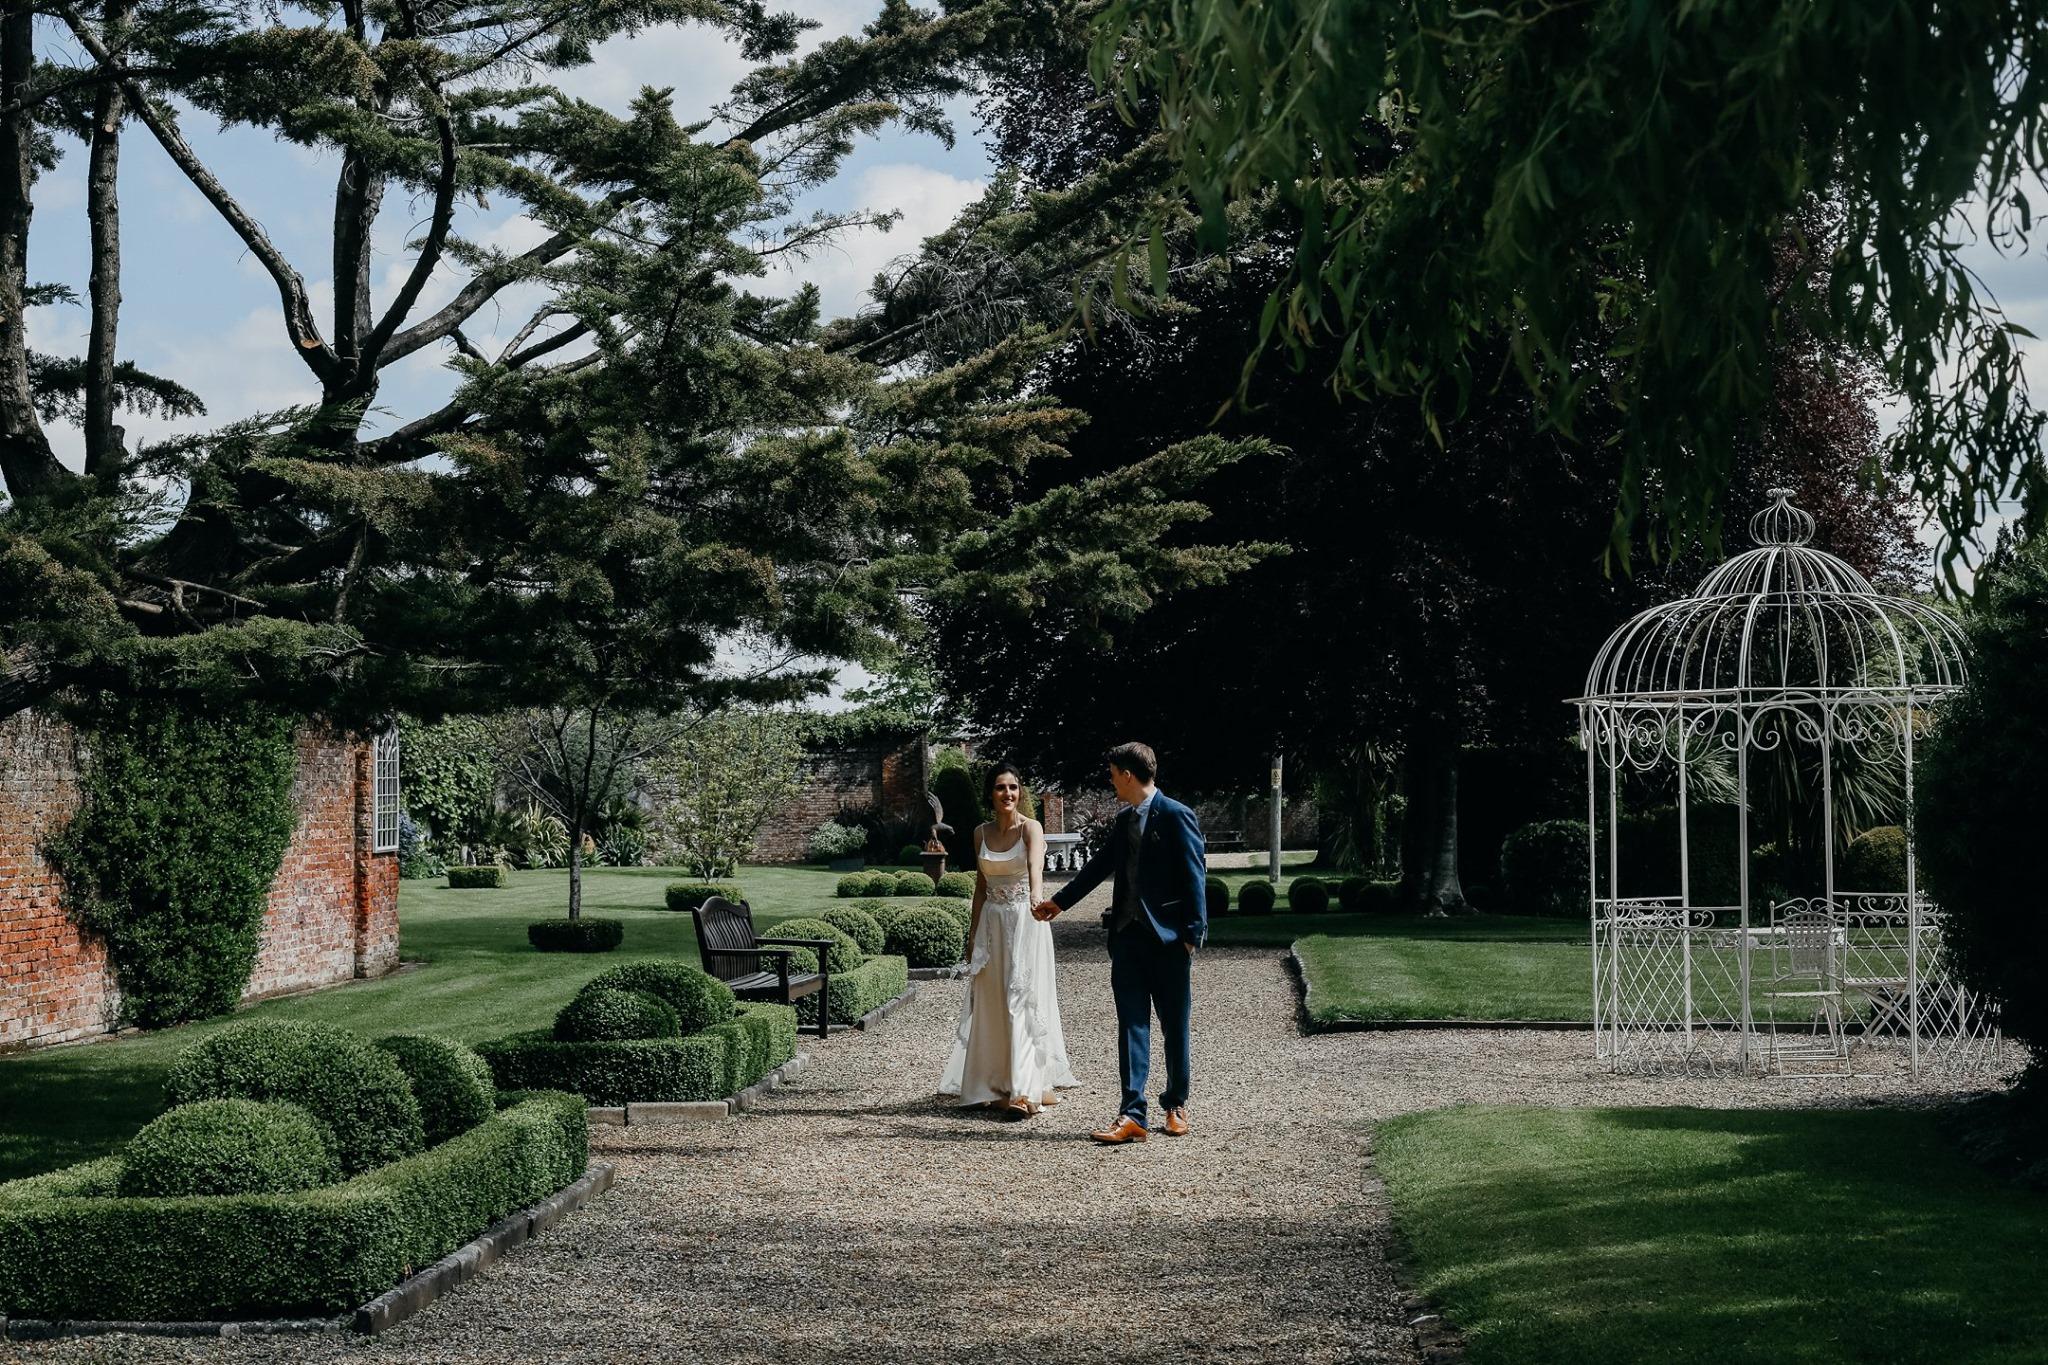 Models wedding venue photoshoot